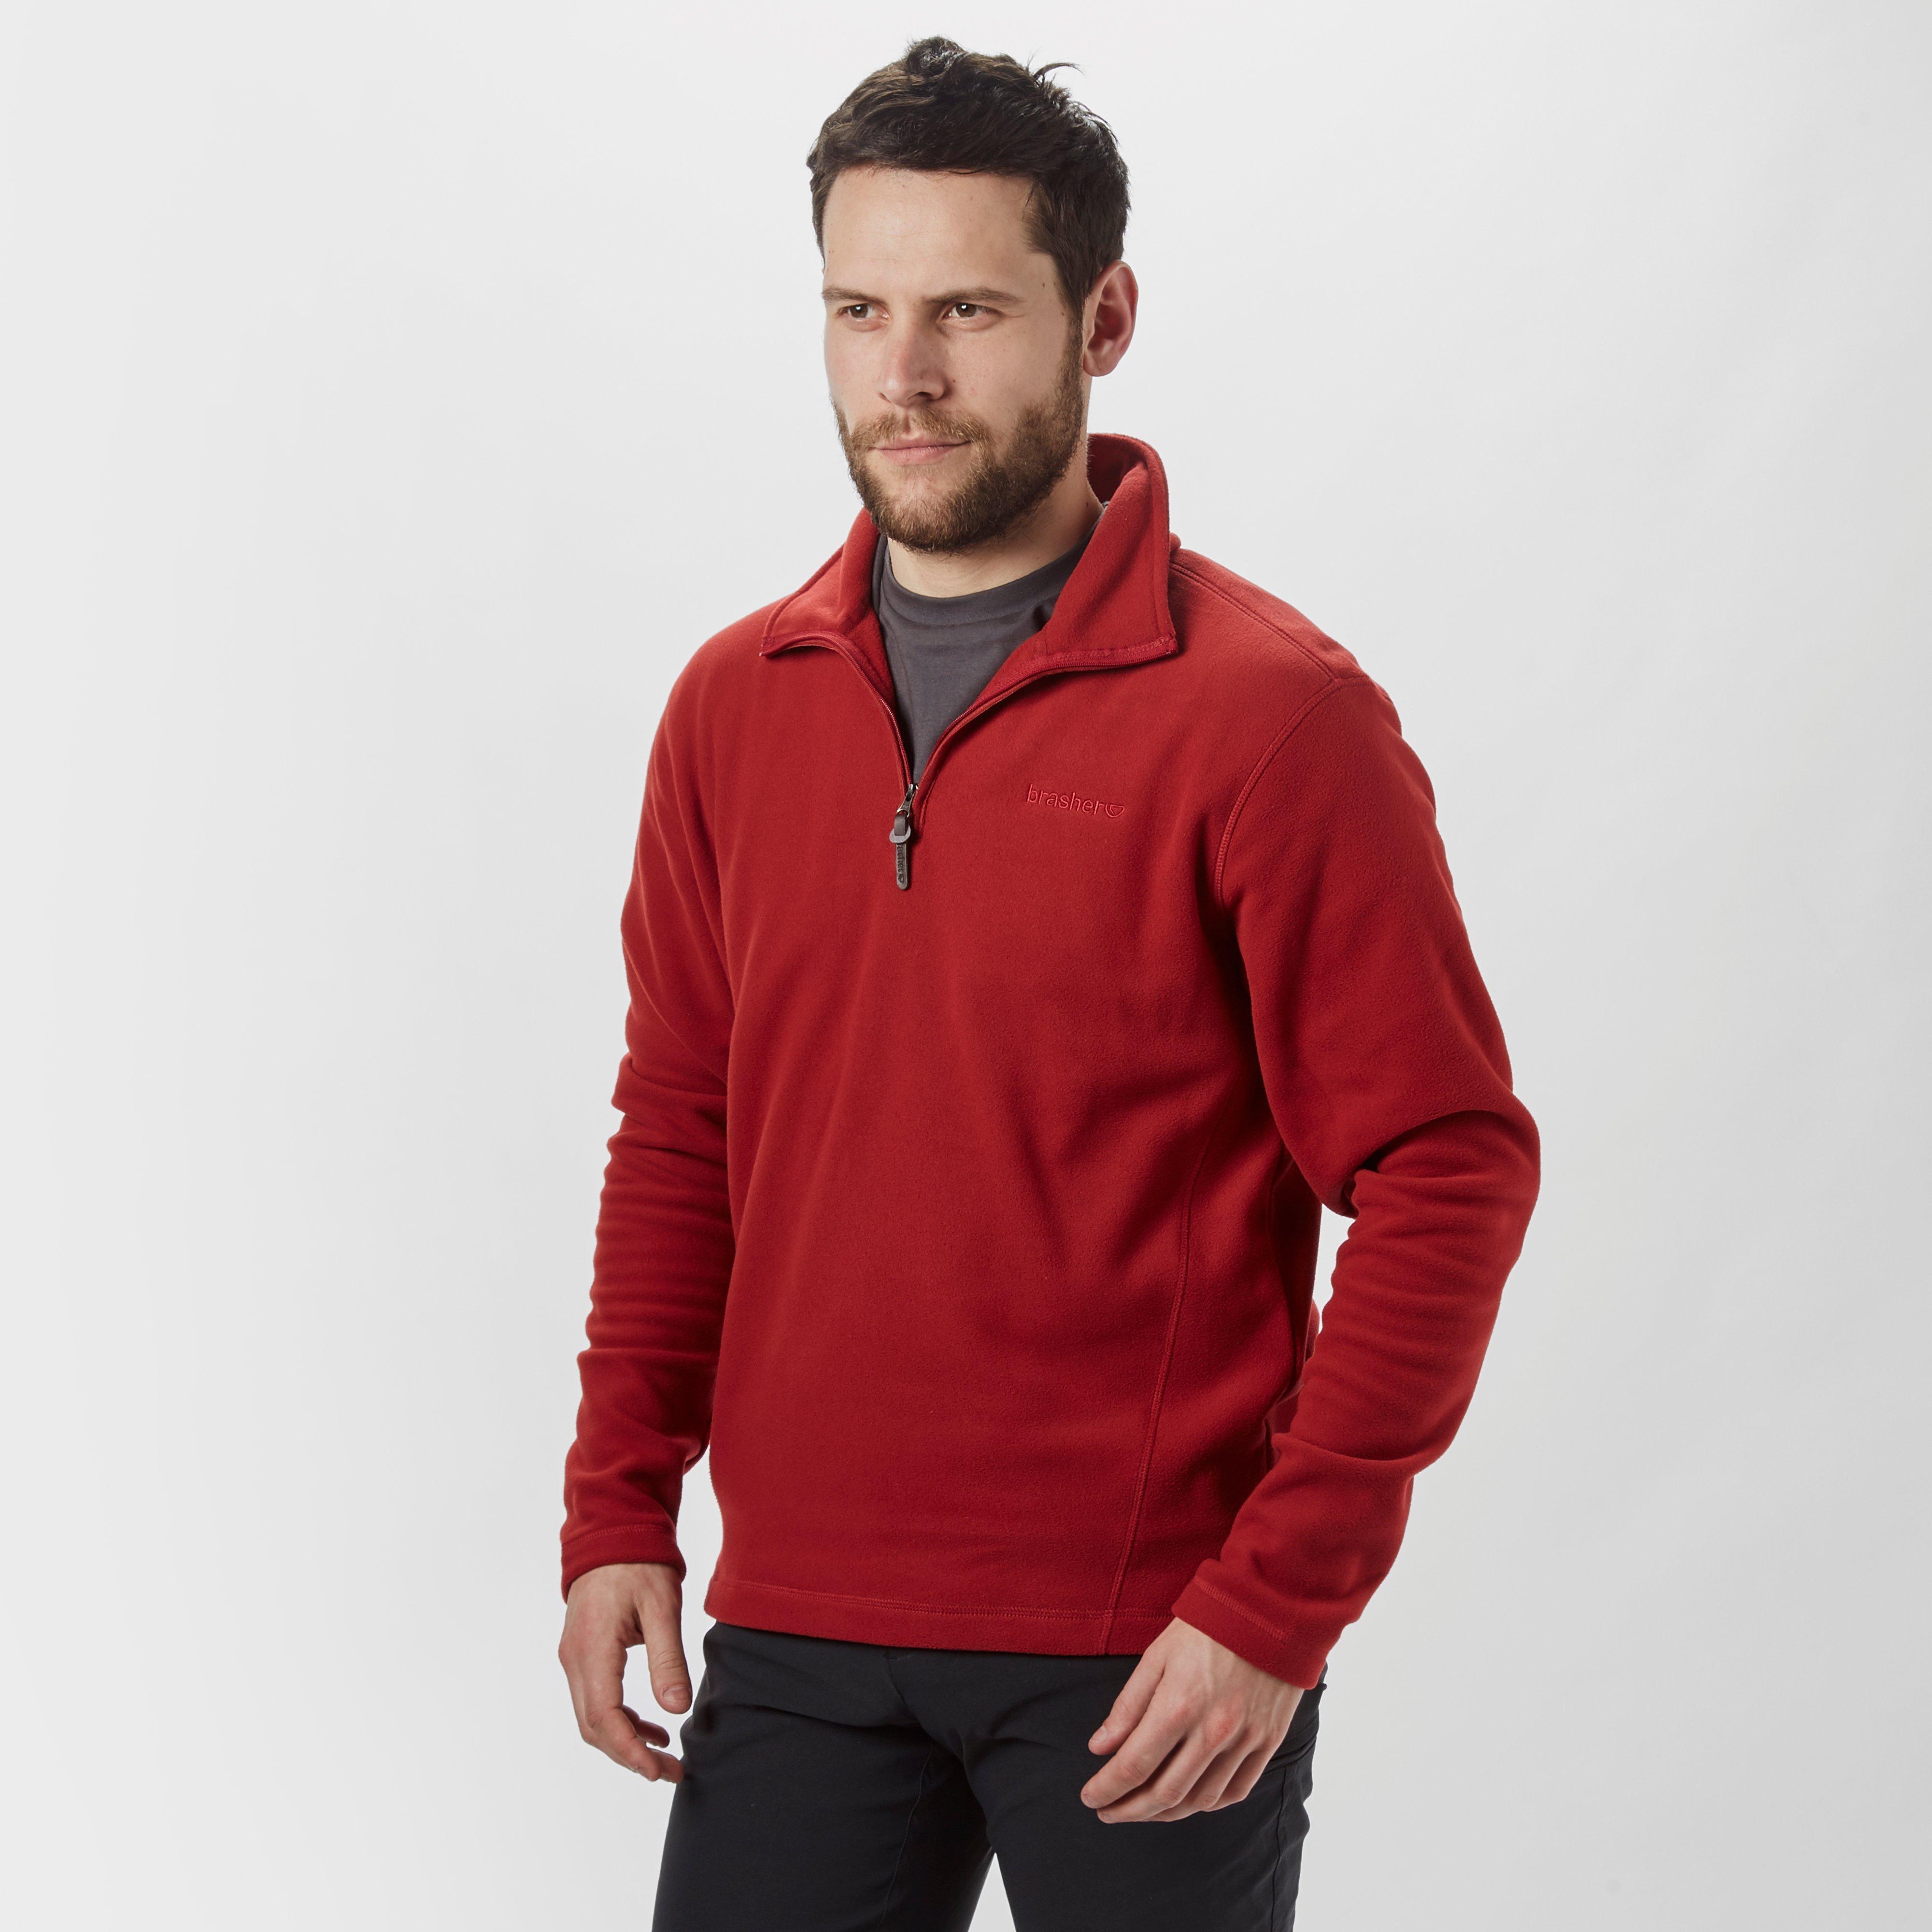 Brasher Brasher Mens Bleaberry Half Zip Fleece - Red, Red